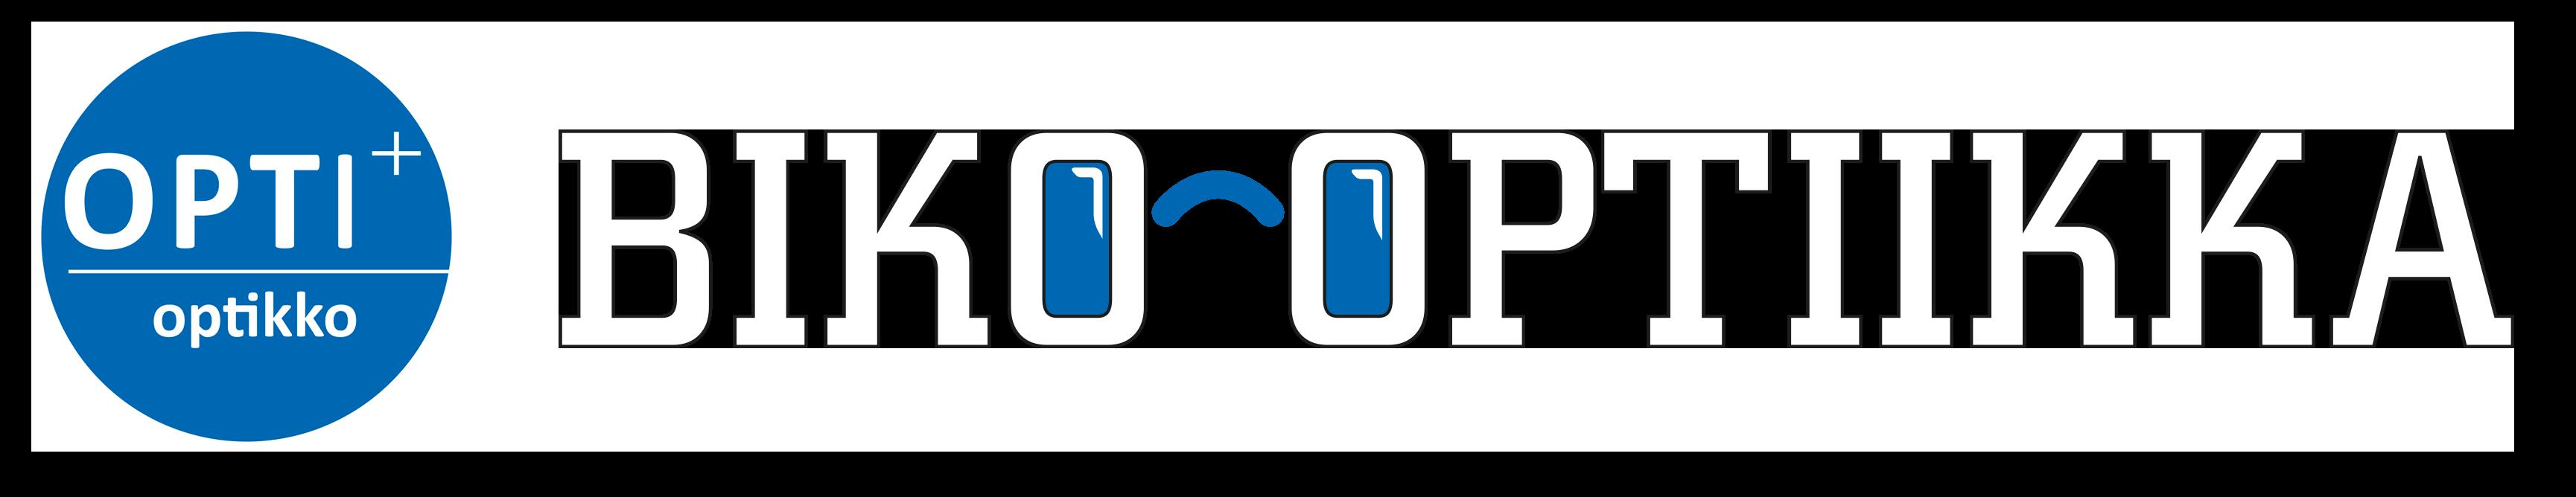 Biko-Optiikka Oy